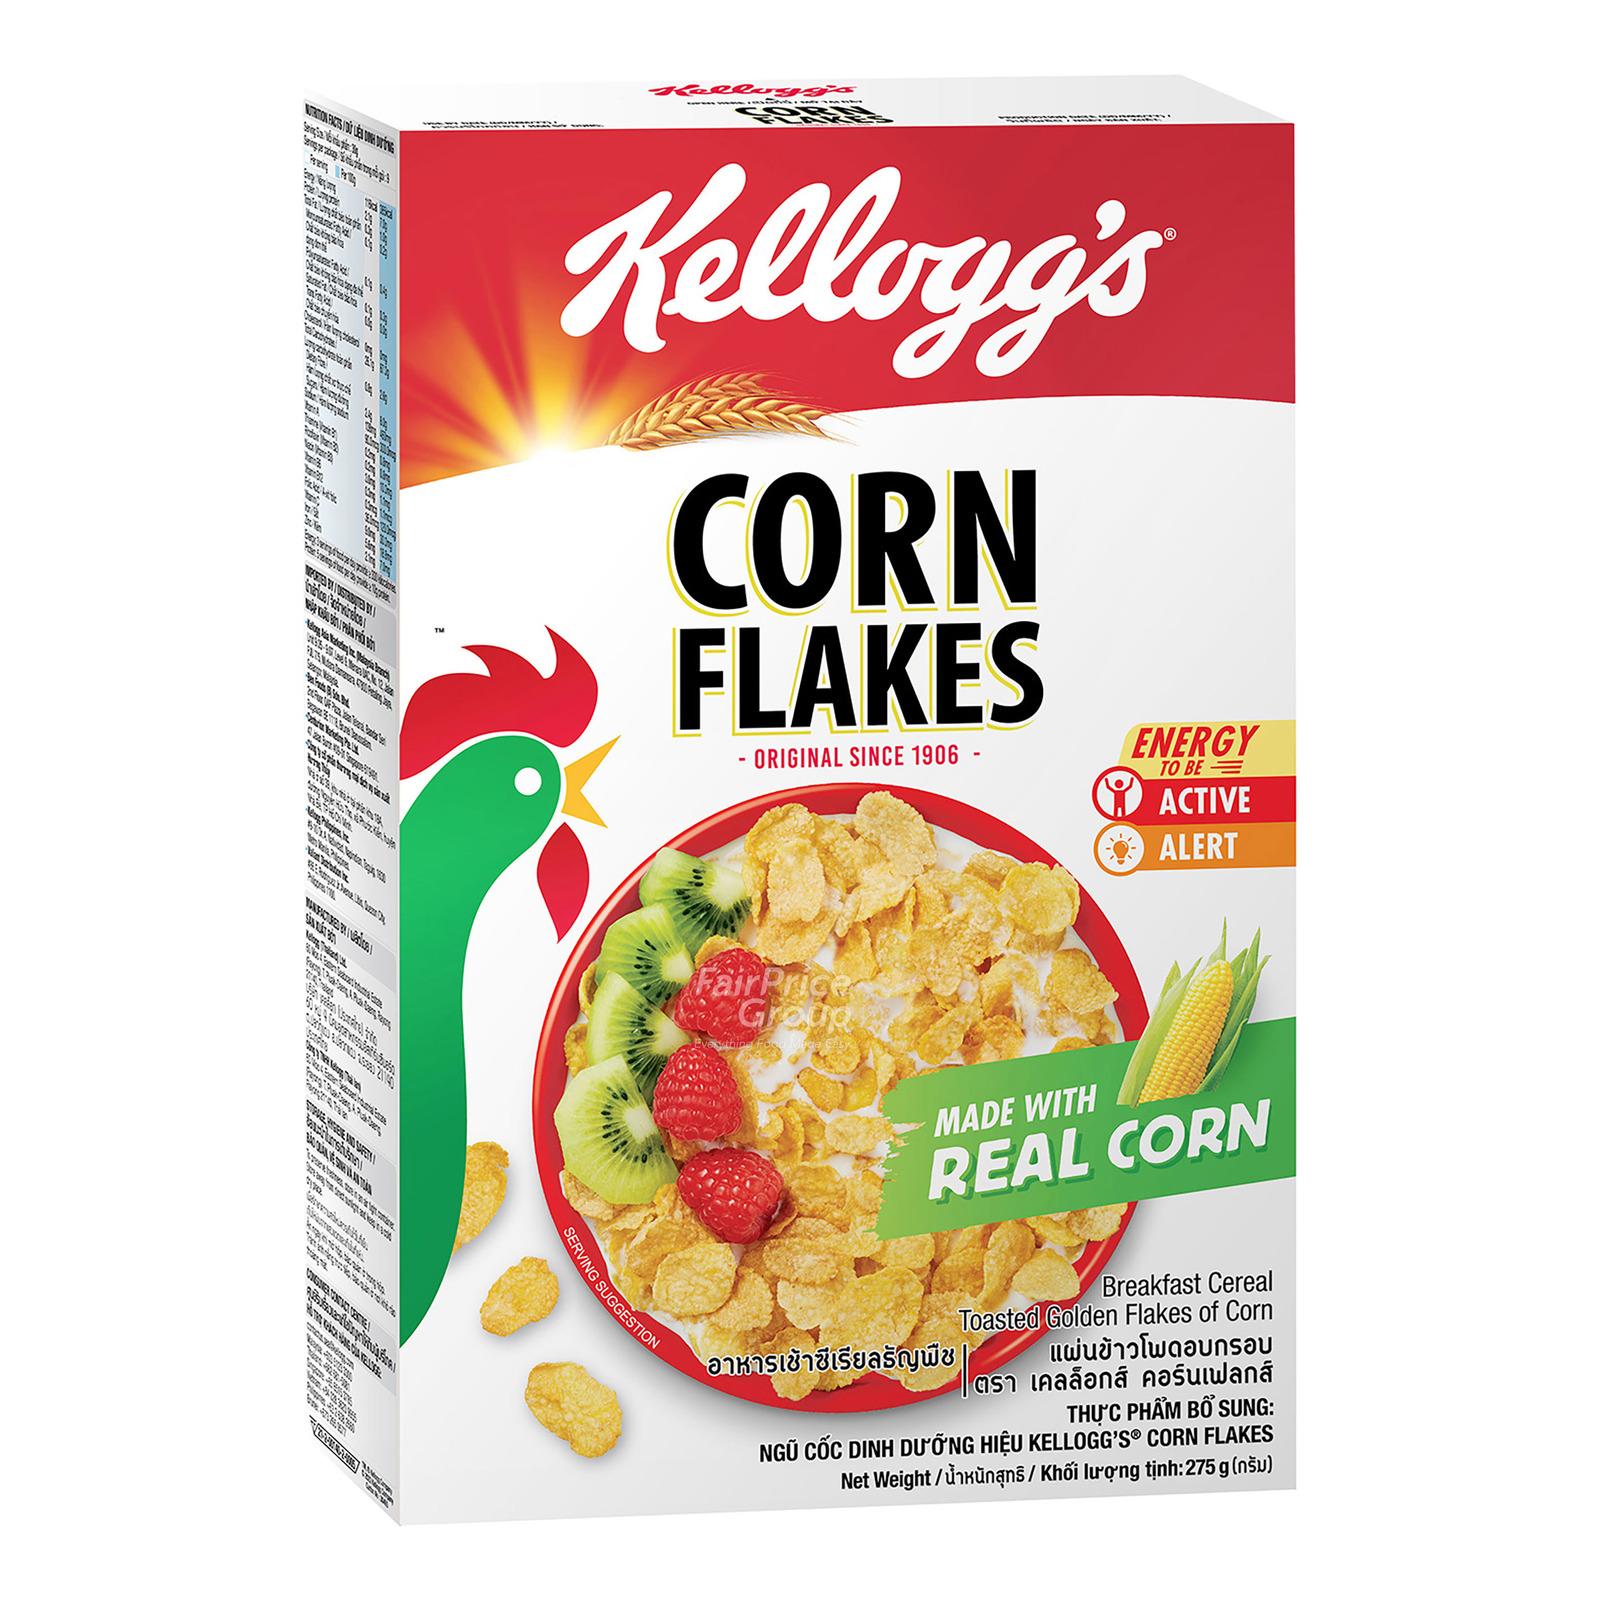 Kellogg's Cereal - Cornflakes